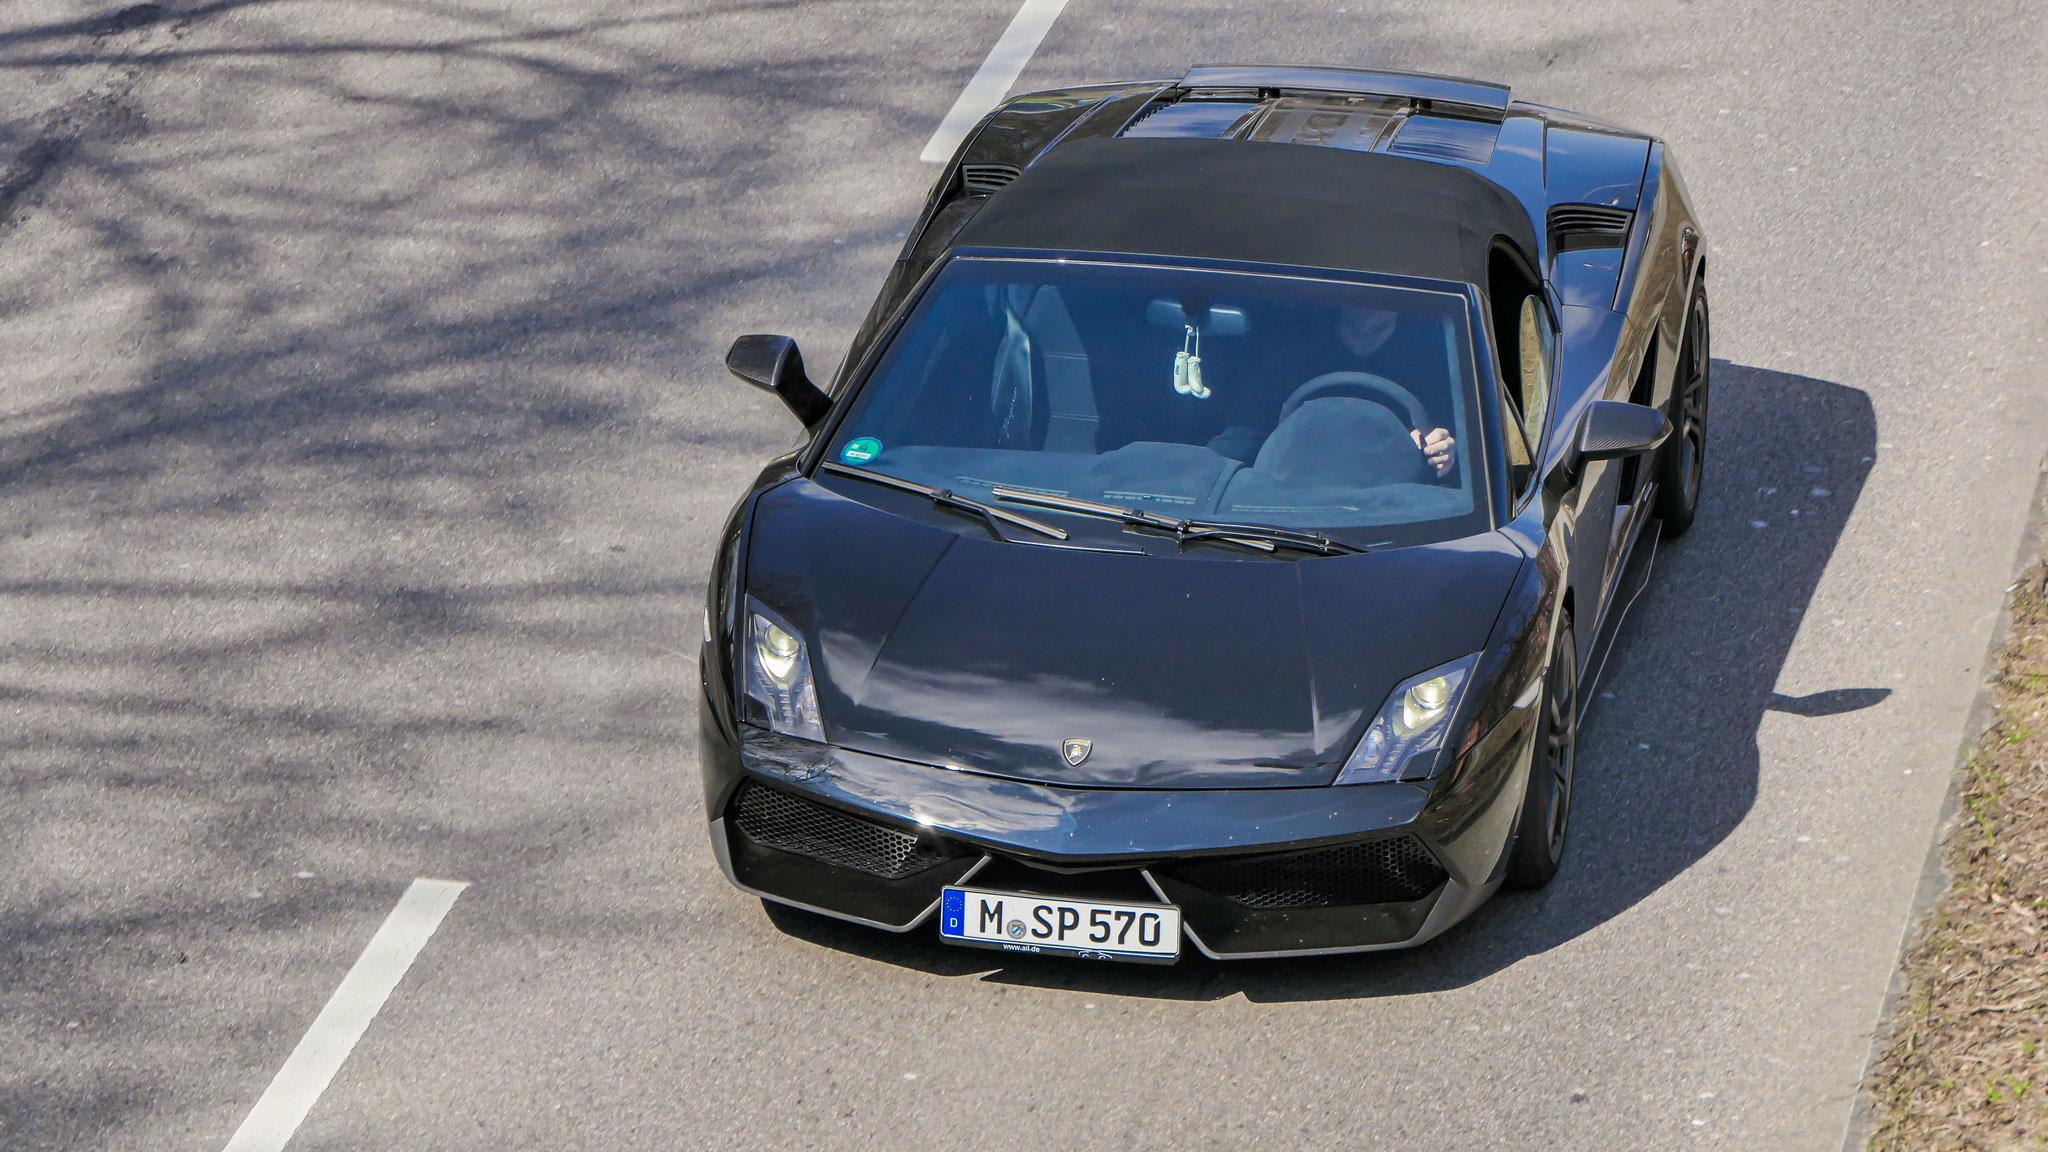 Lamborghini Gallardo LP 550 Spyder - M-SP-570